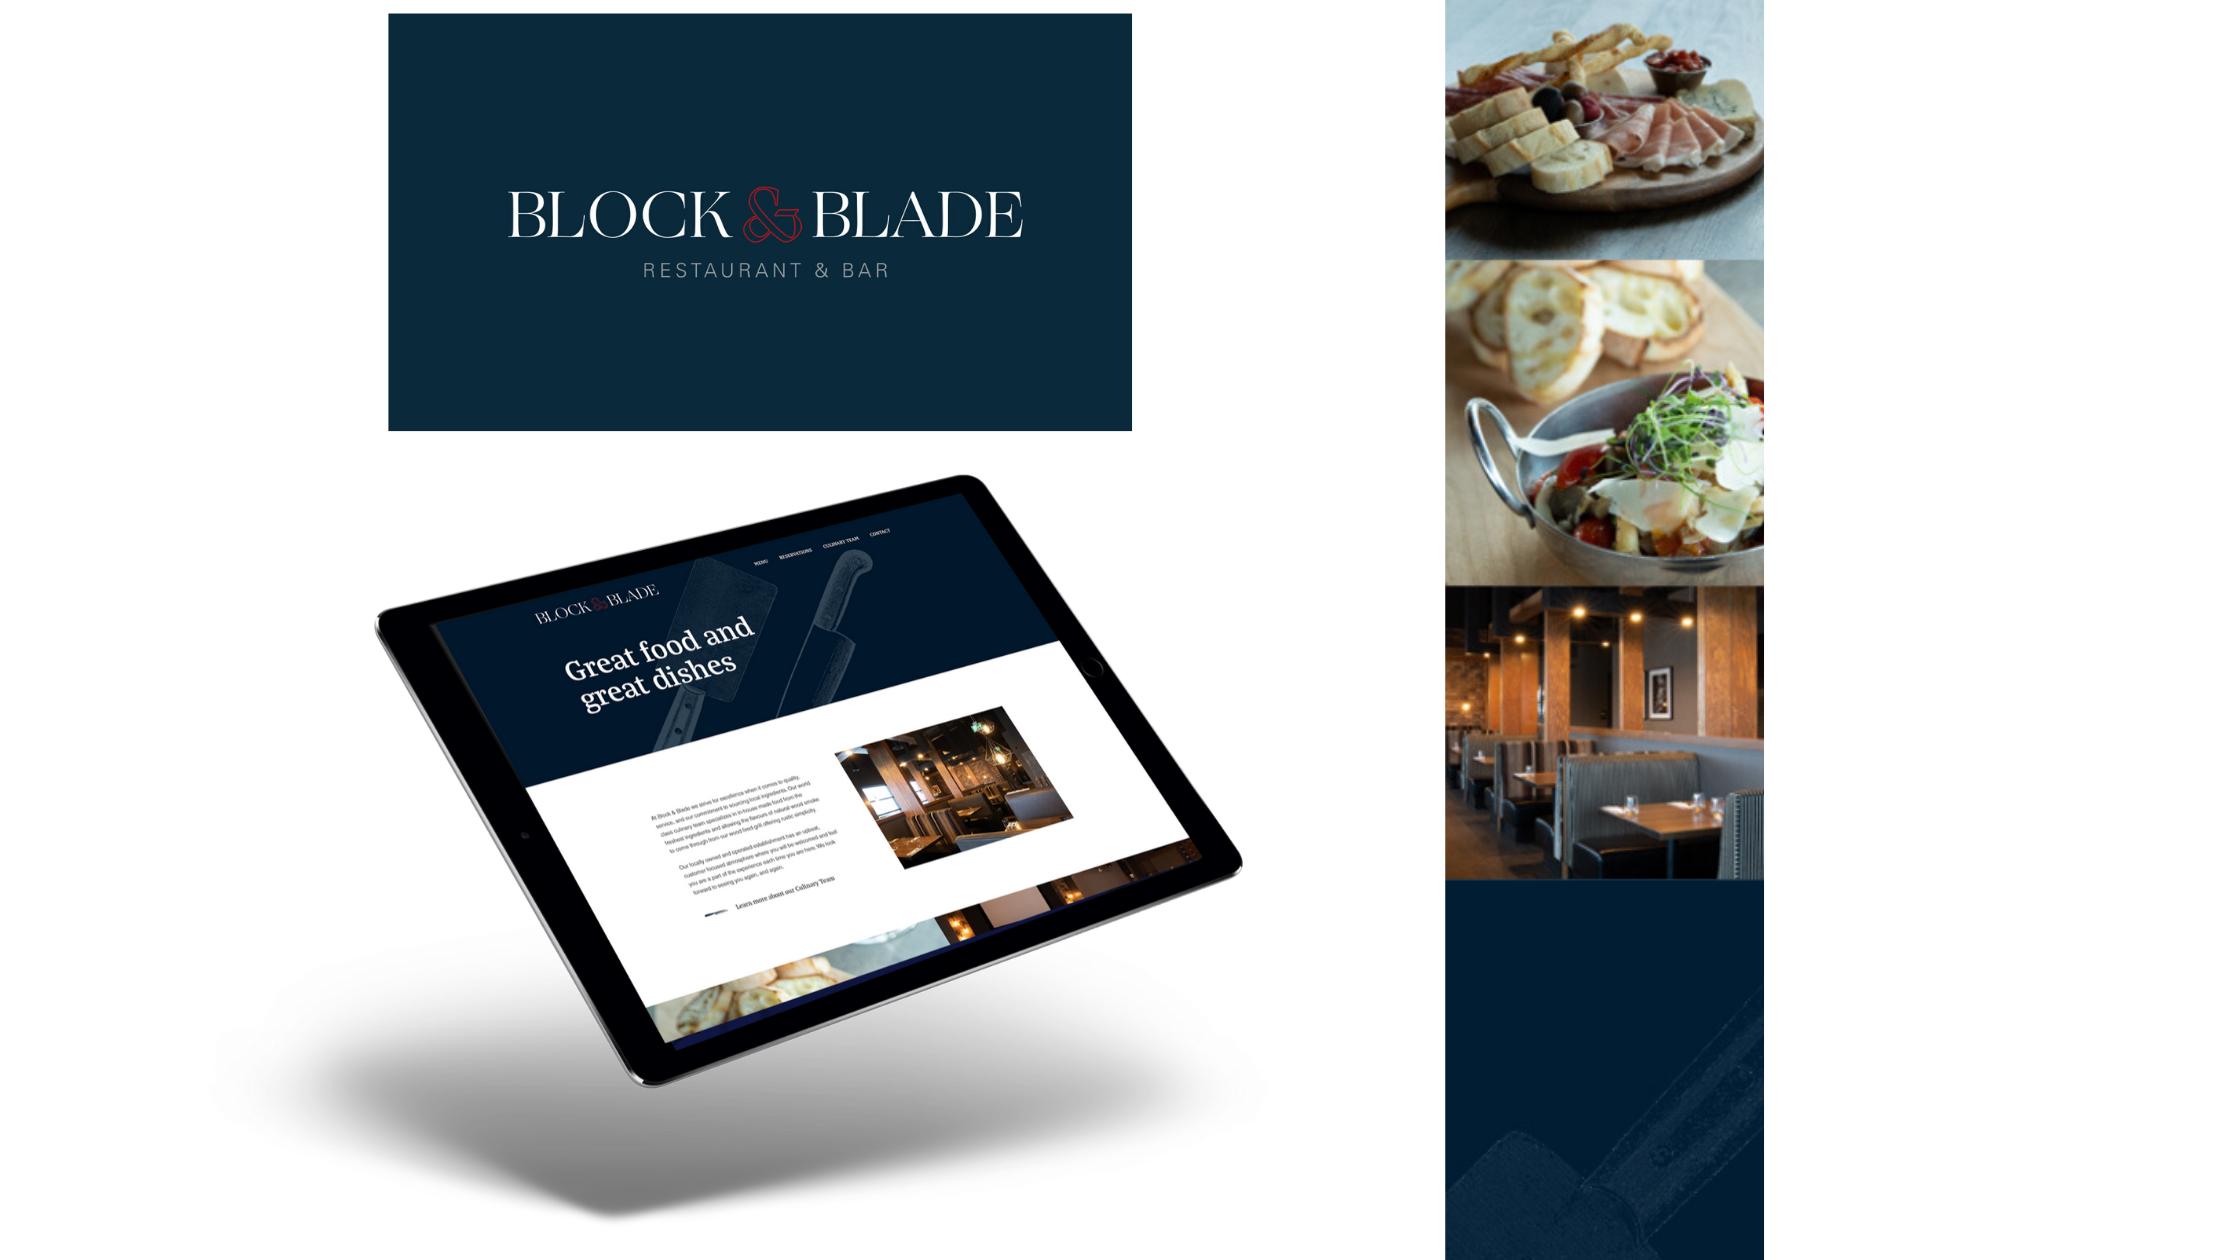 Edge summer 2020 - our recent work - Block & Blade